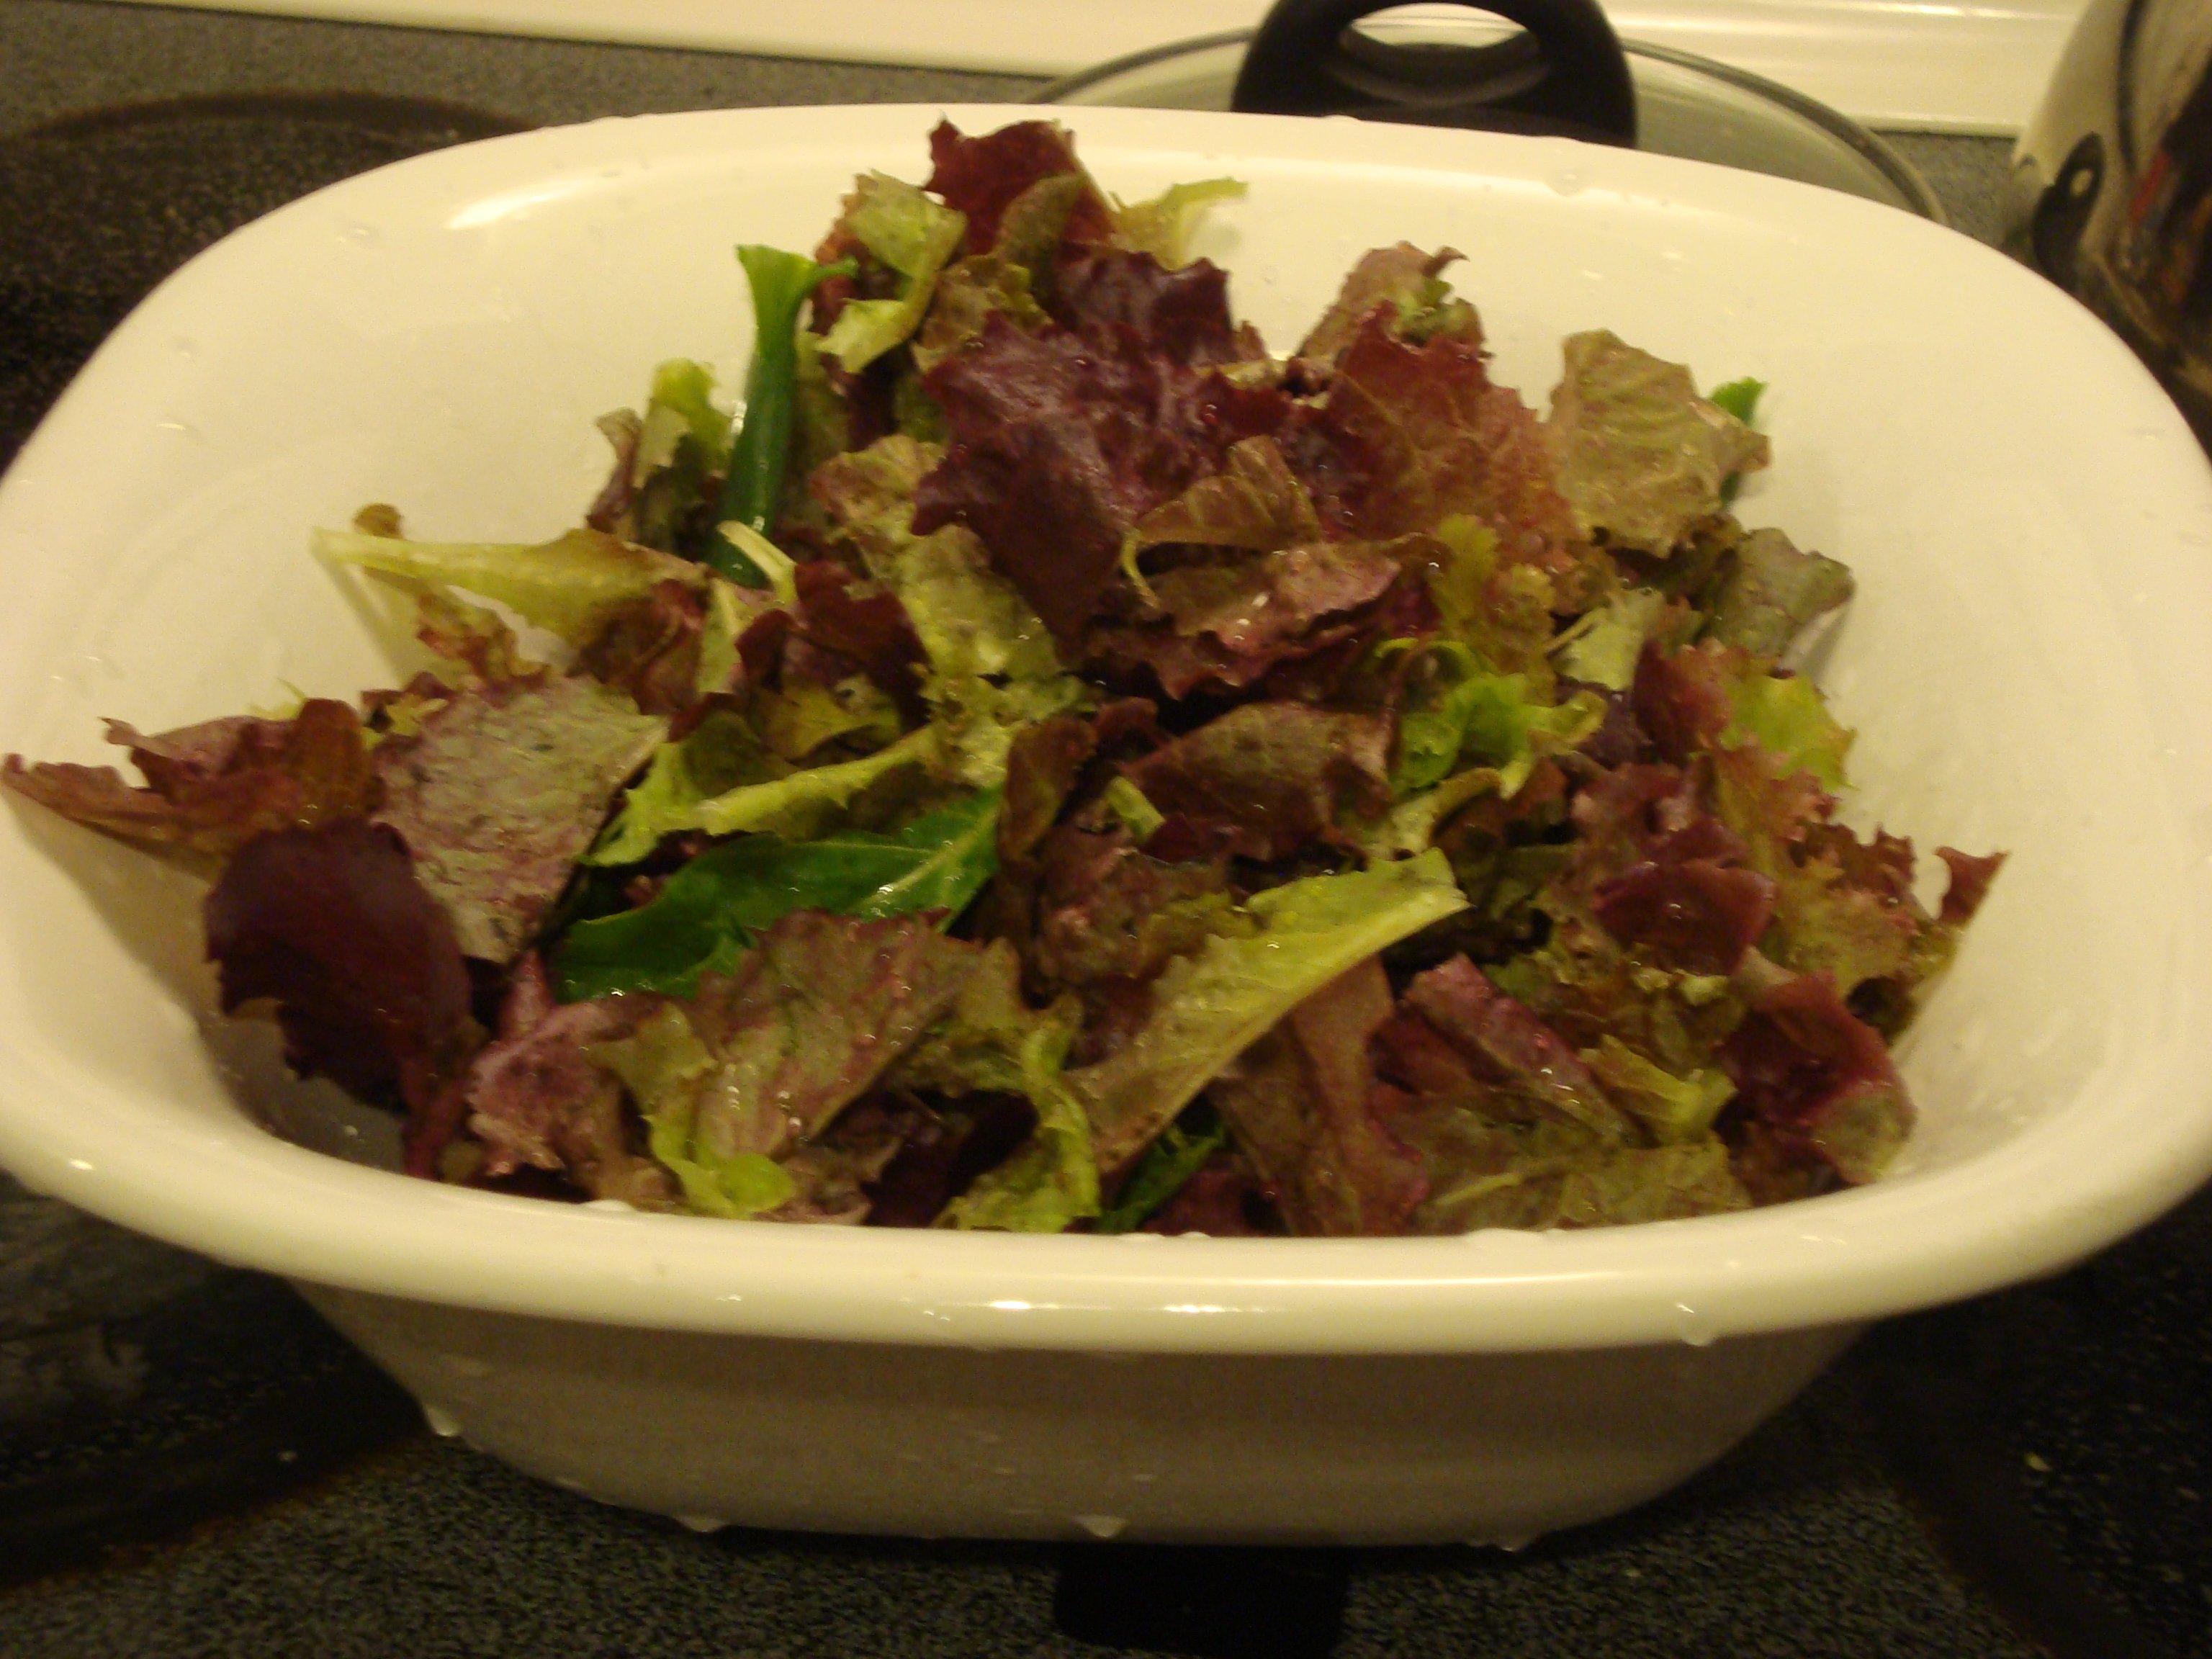 Aquaponics grown salad